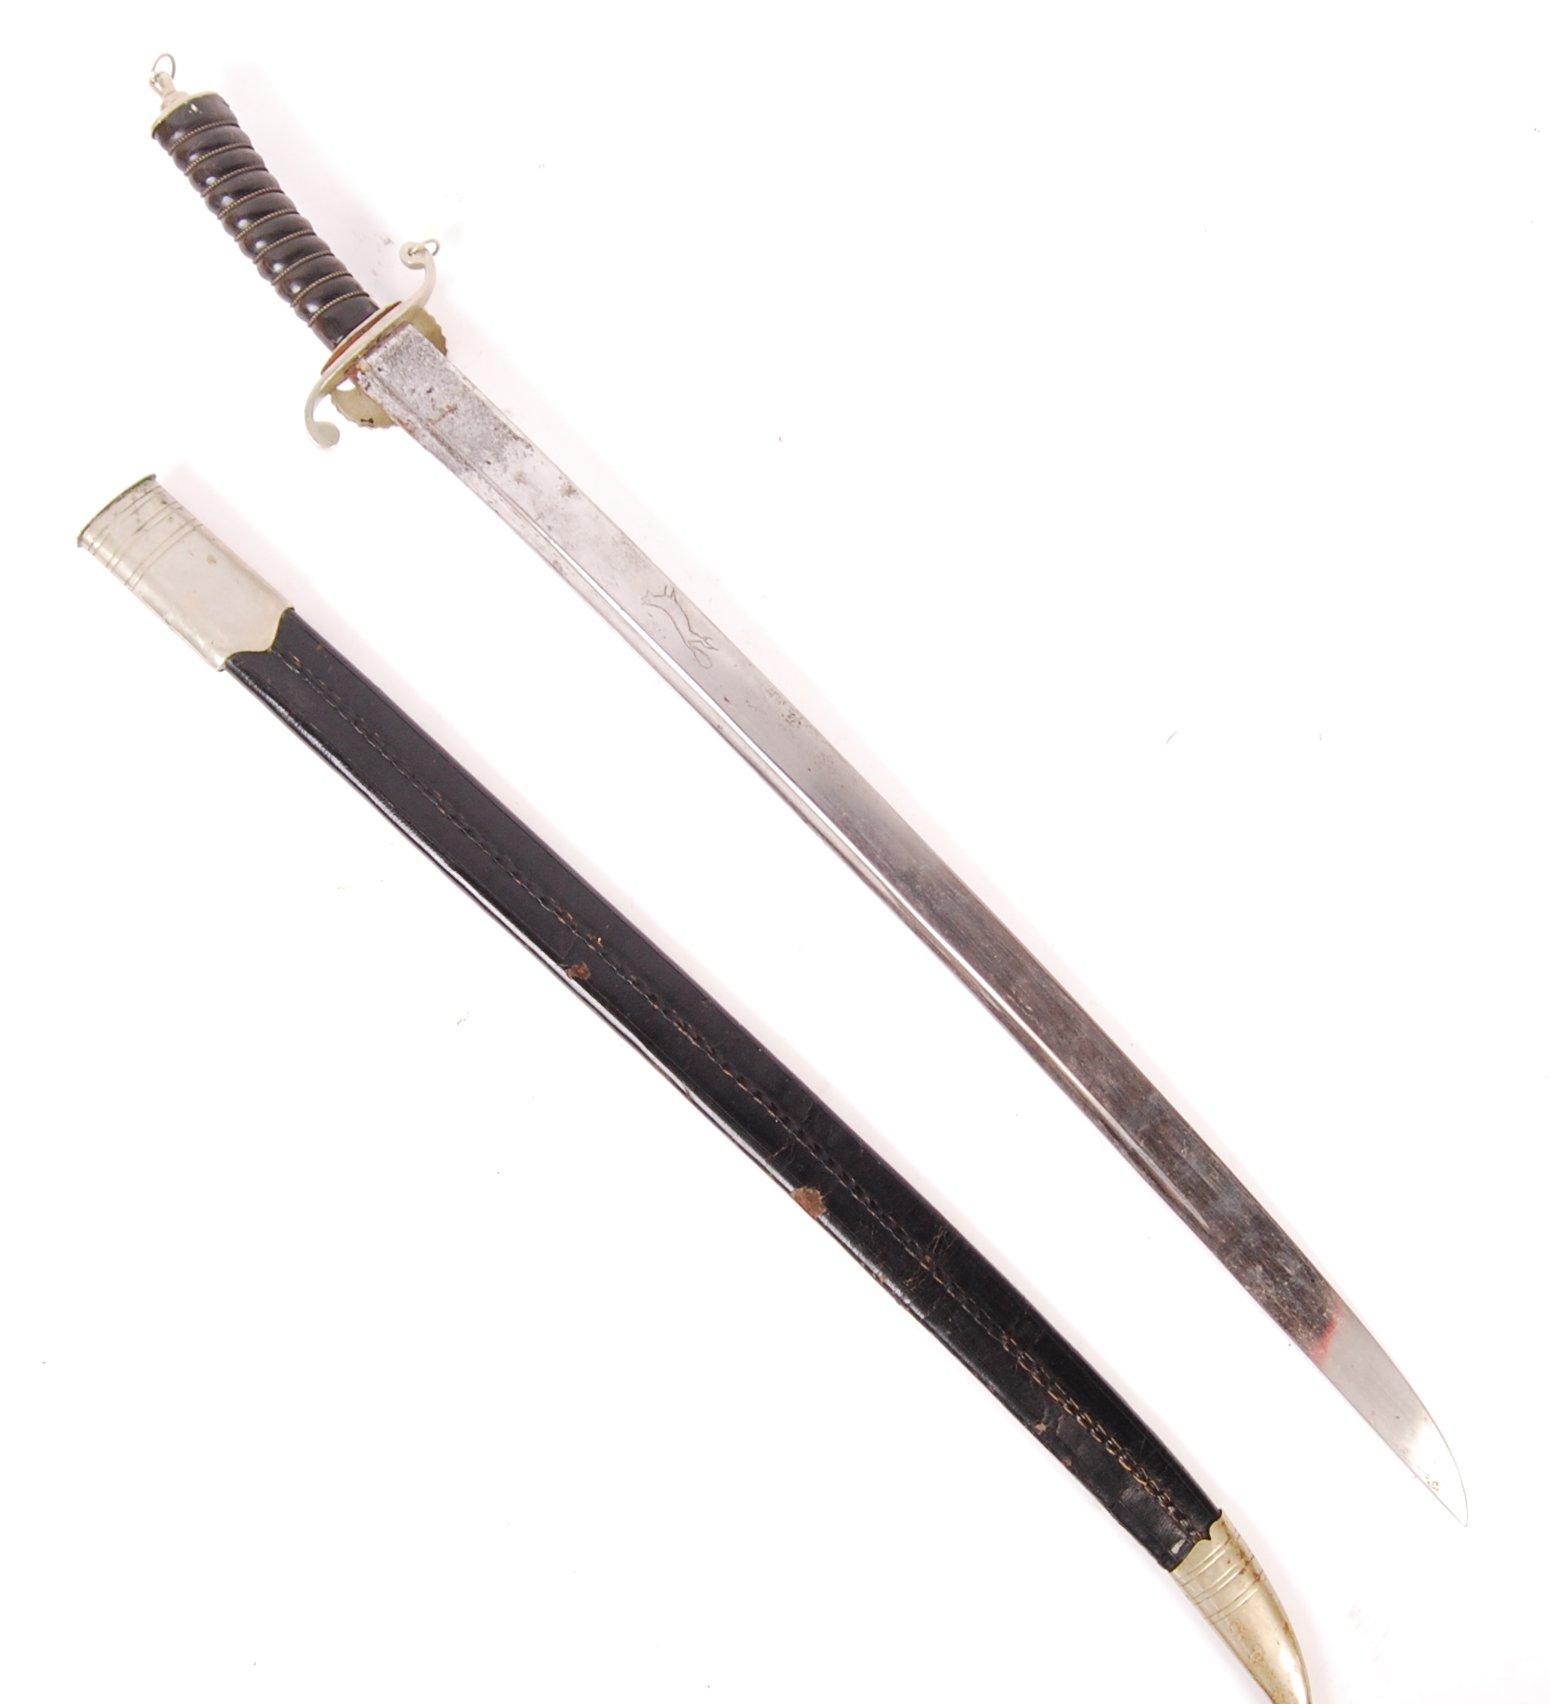 19TH CENTURY GERMAN / PRUSSIAN HUNTING SWORD - Image 2 of 4